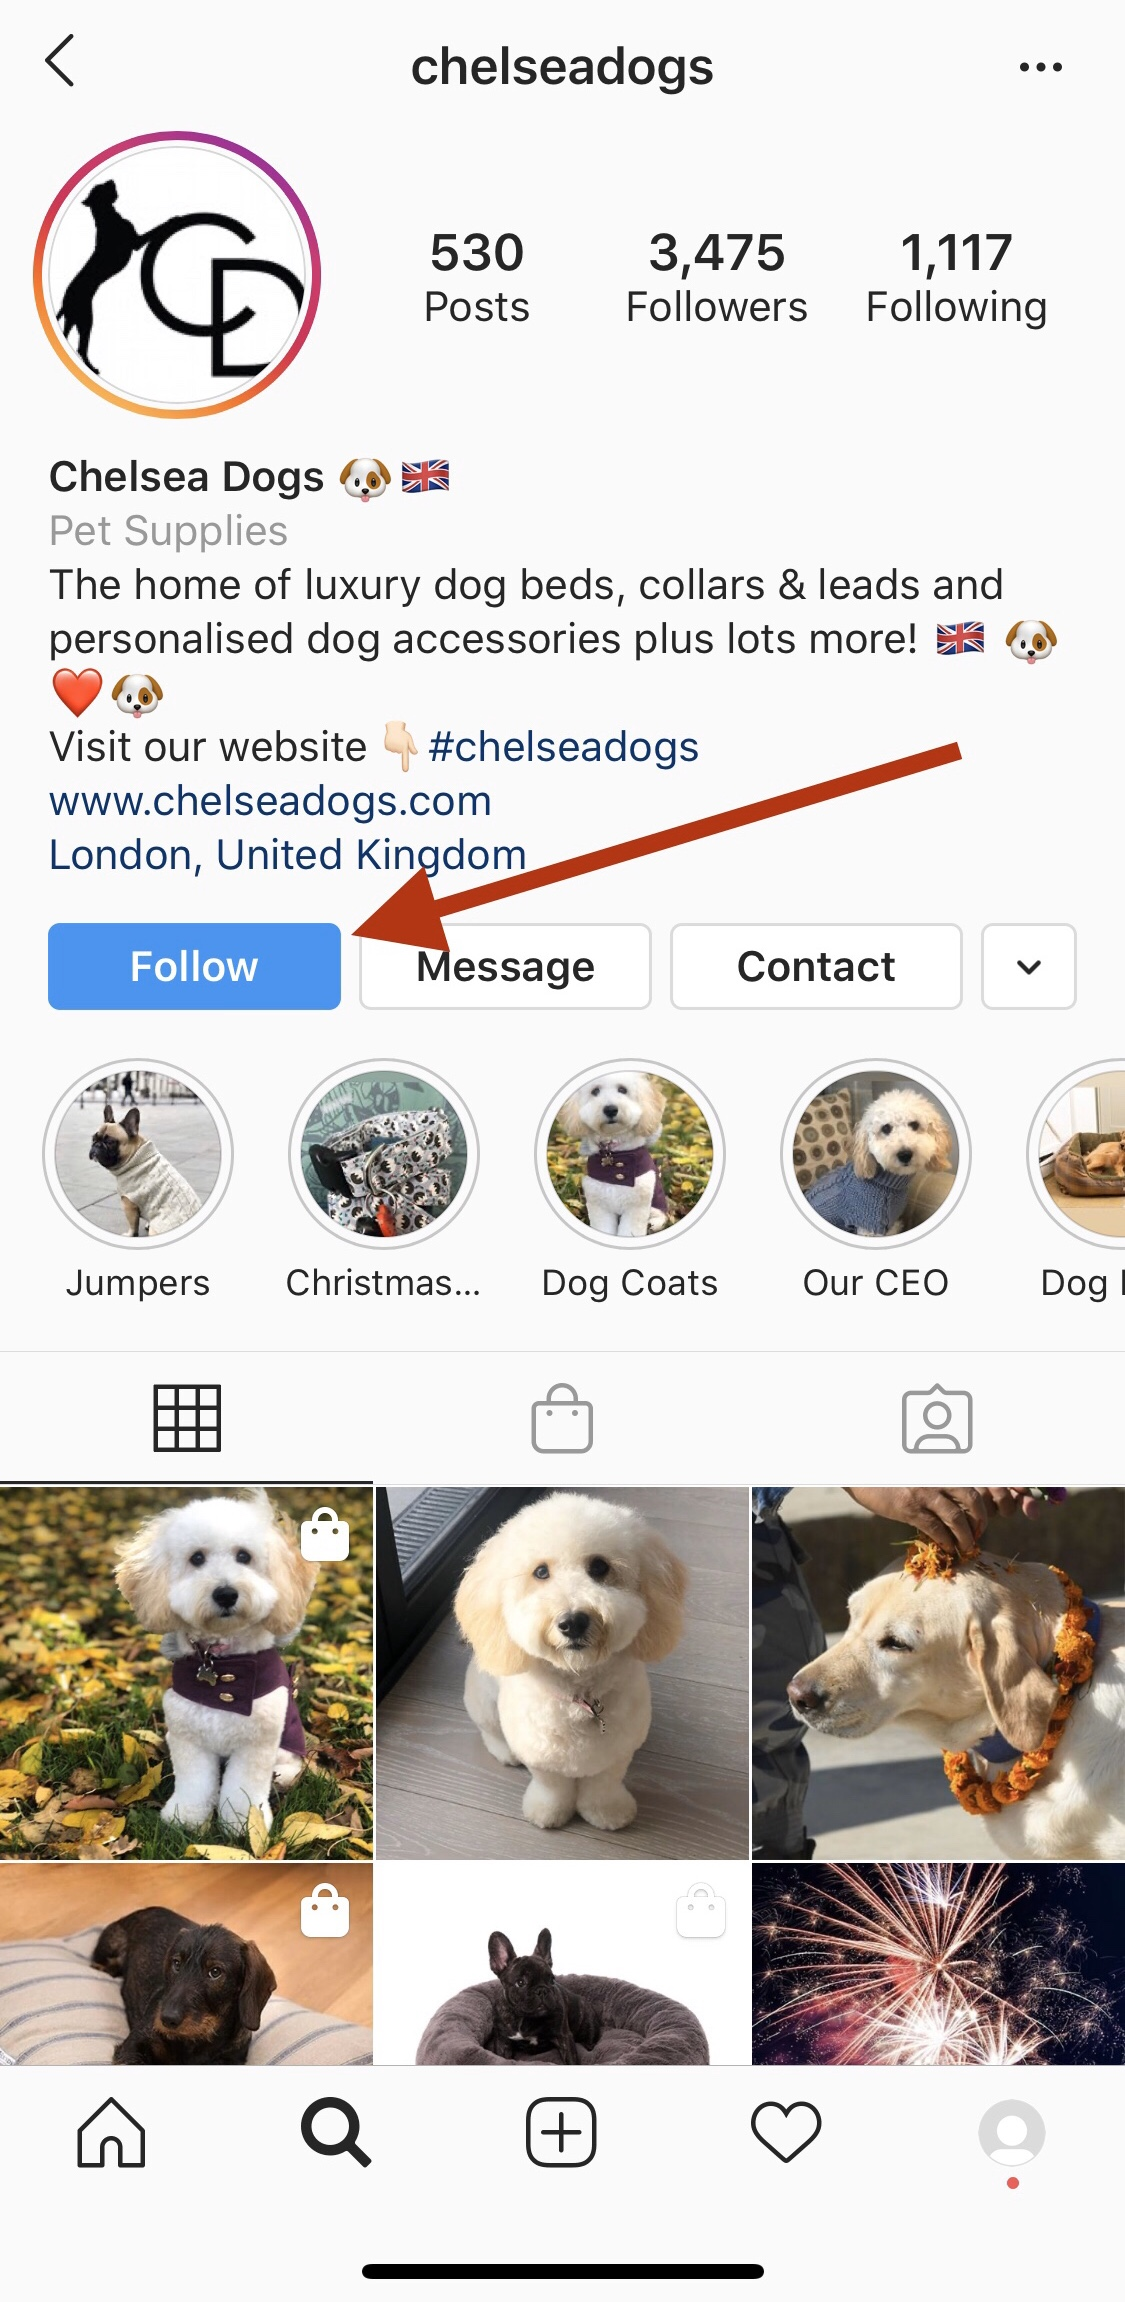 Chelsea Dogs on Instagram